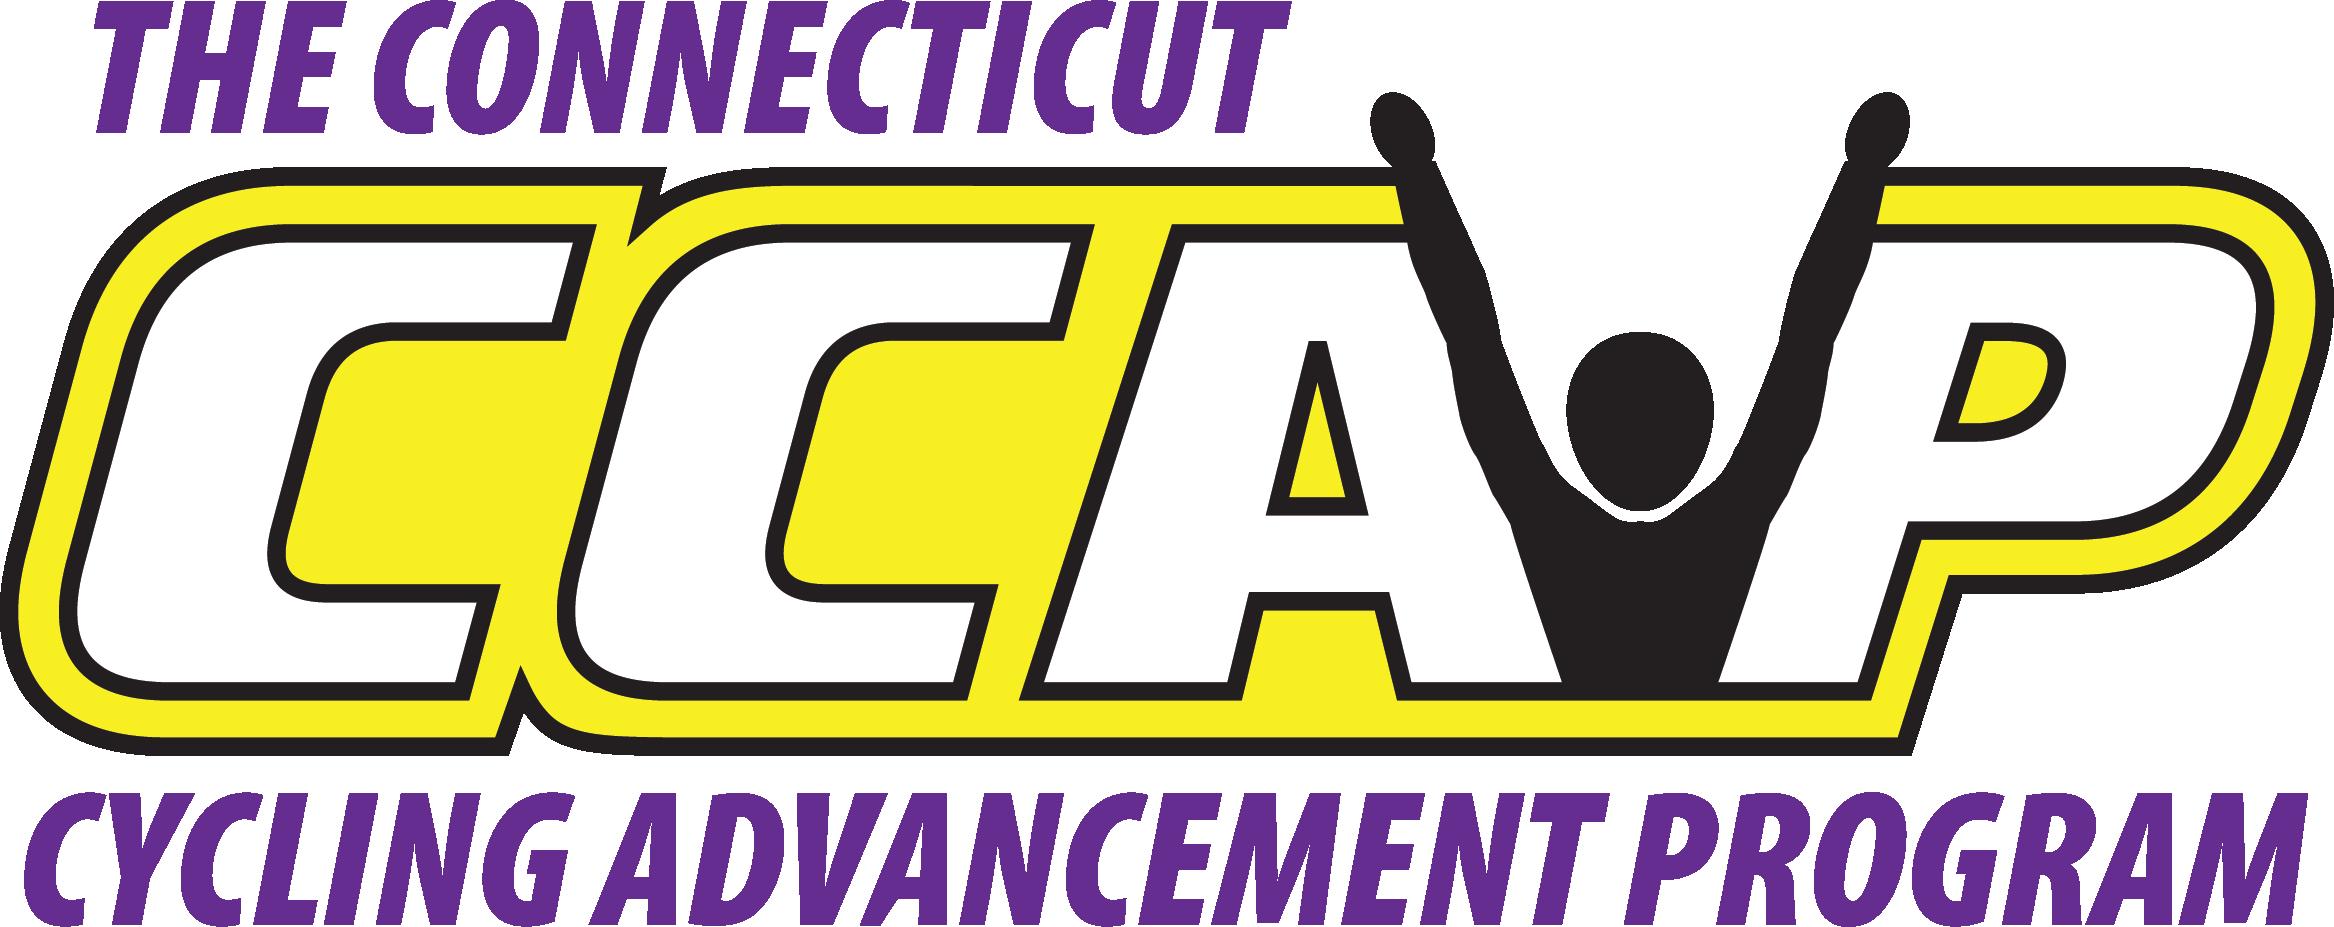 The CT Cycling Advancement Program Logo